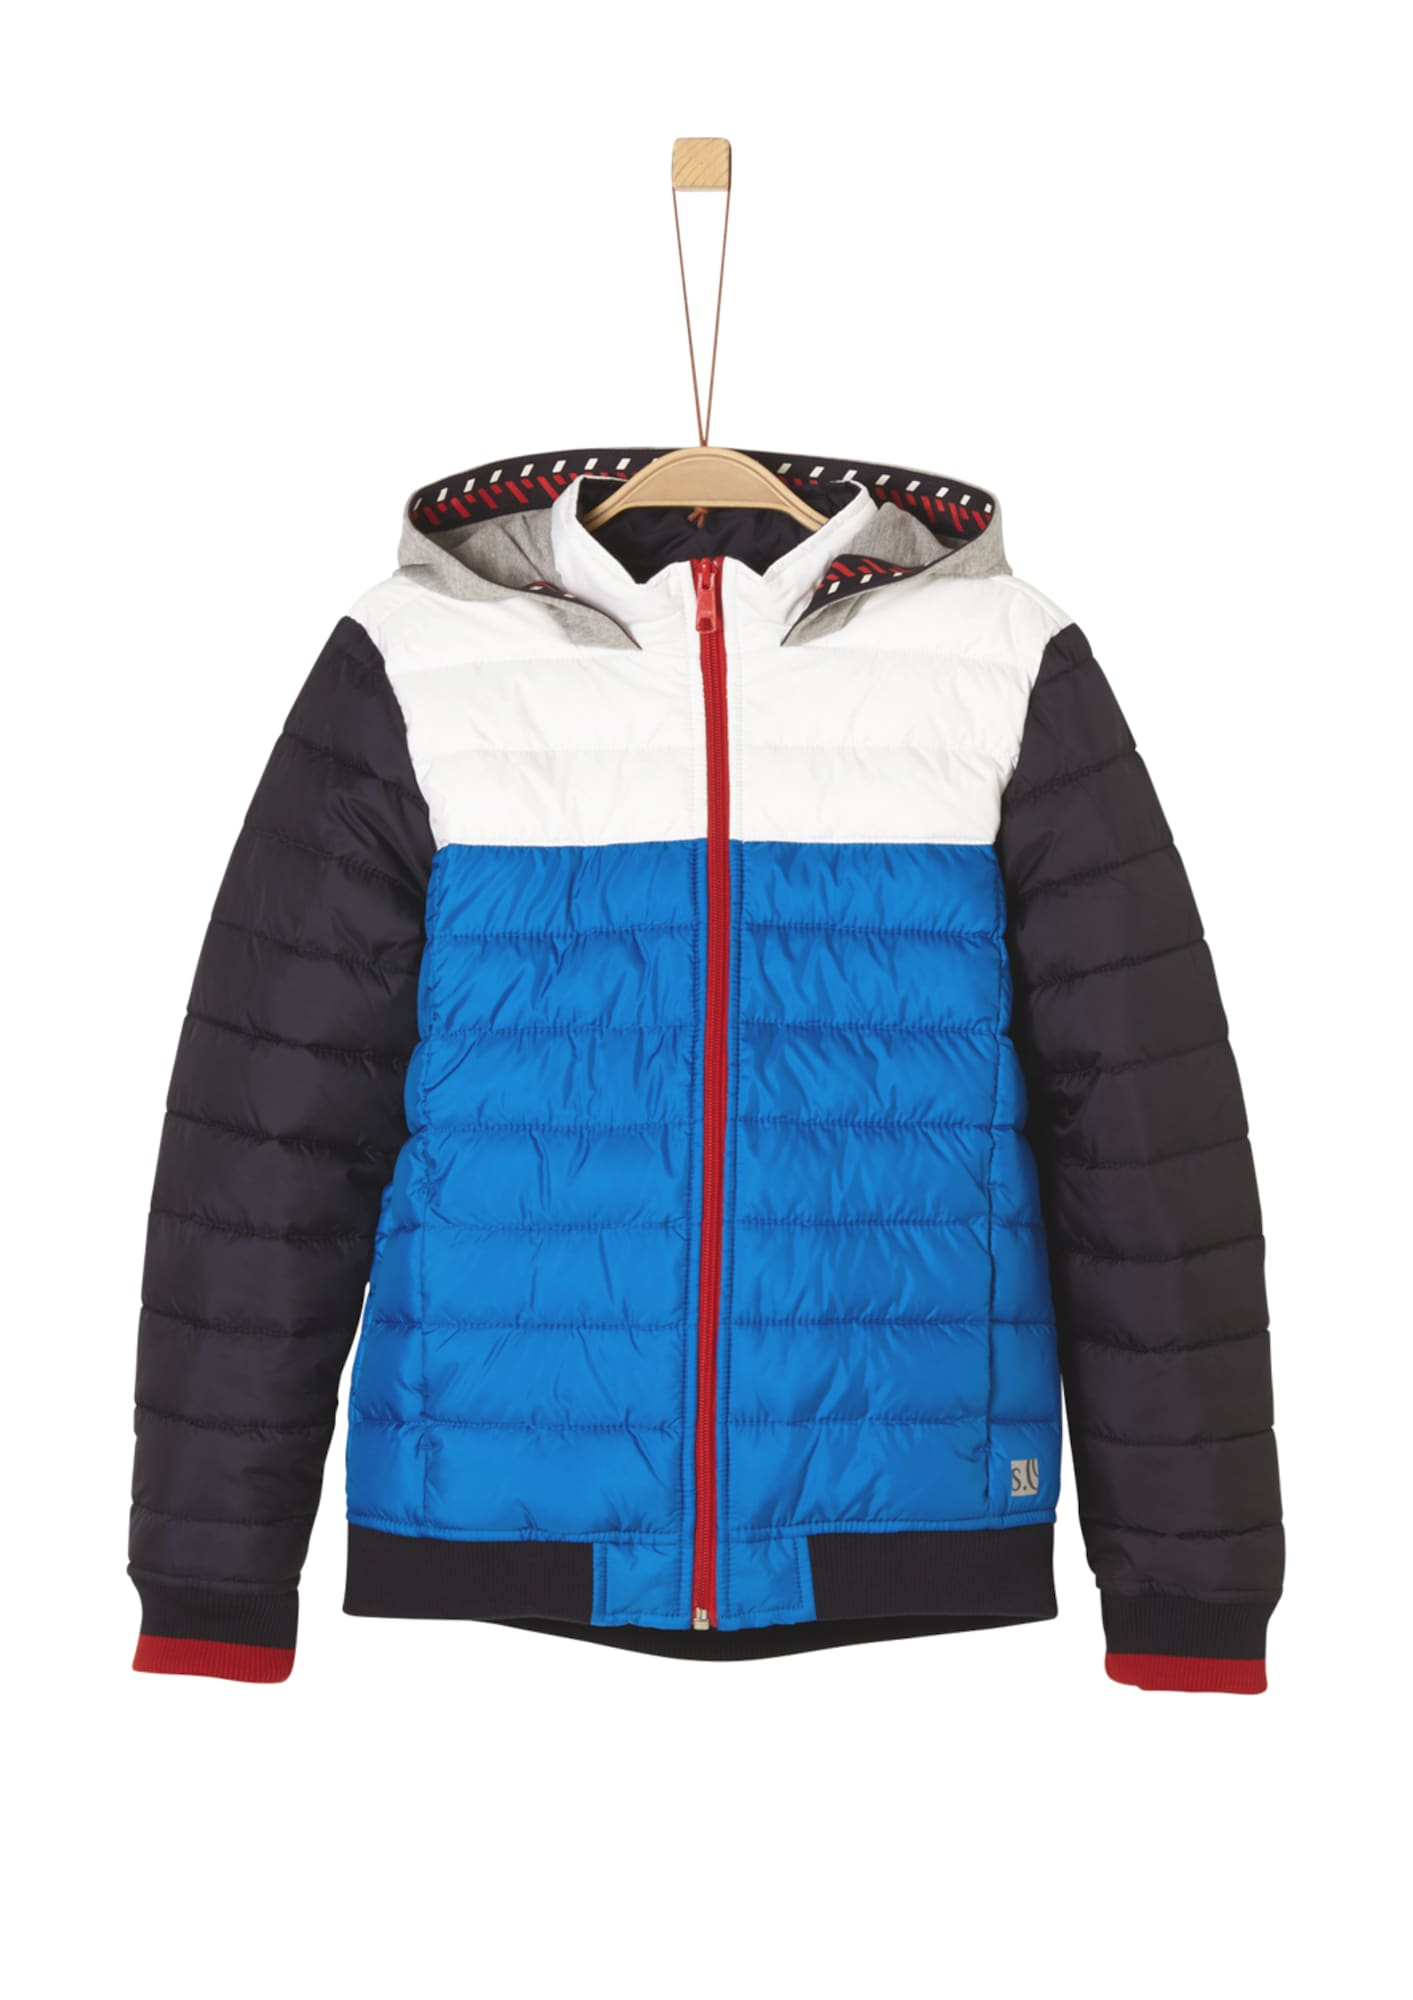 Funkční bunda modrá šedá červená černá bílá S.Oliver Junior